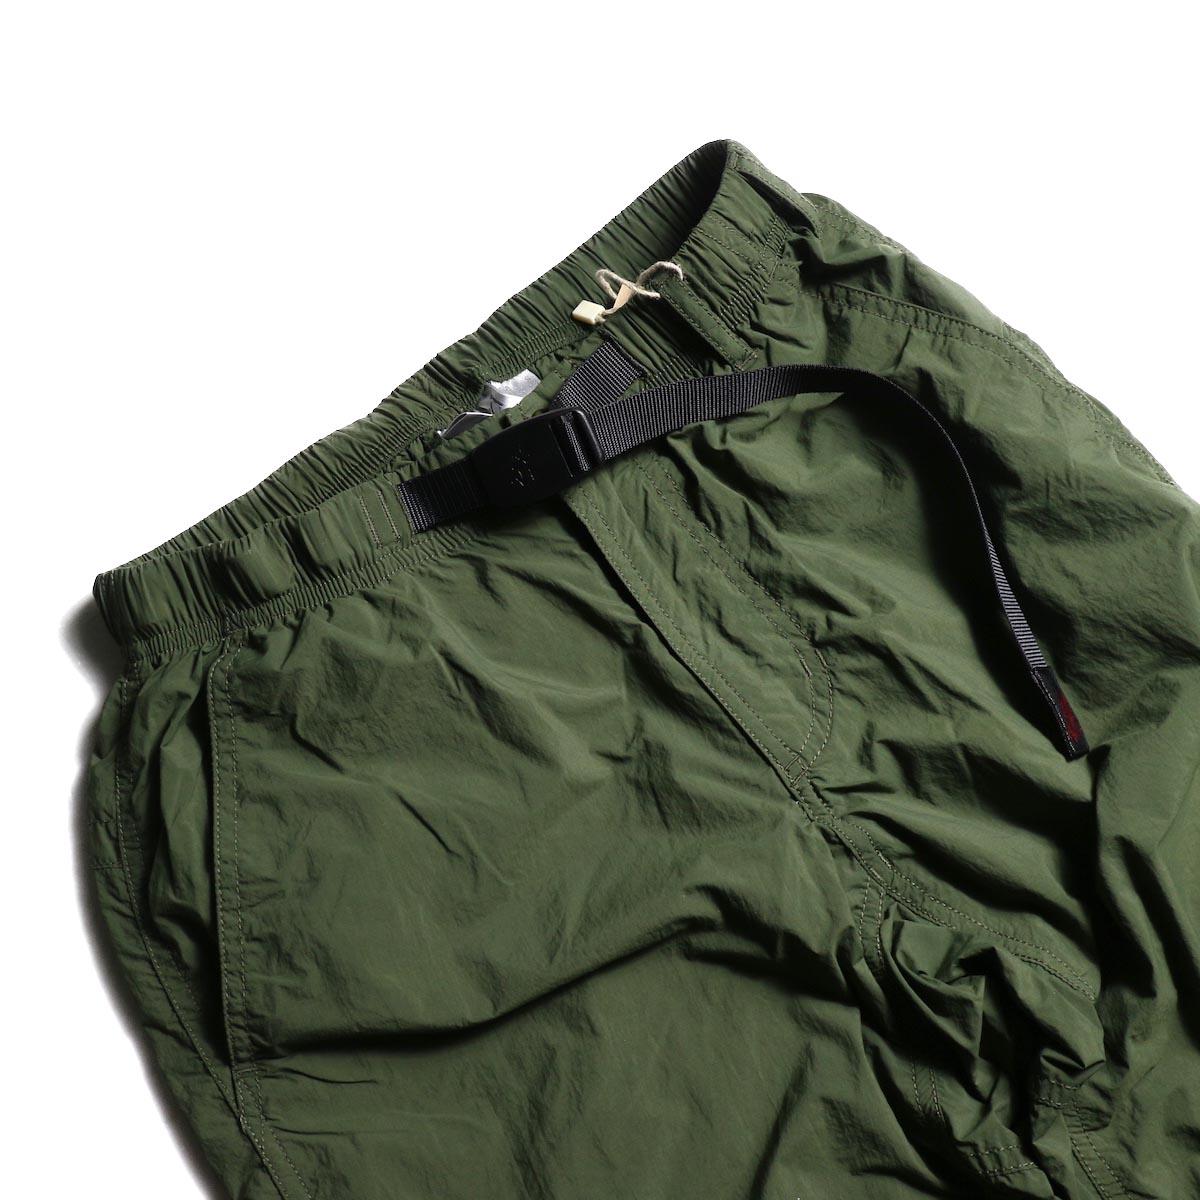 GRAMICCI / Packable Truck Pants (Olive) ウエスト